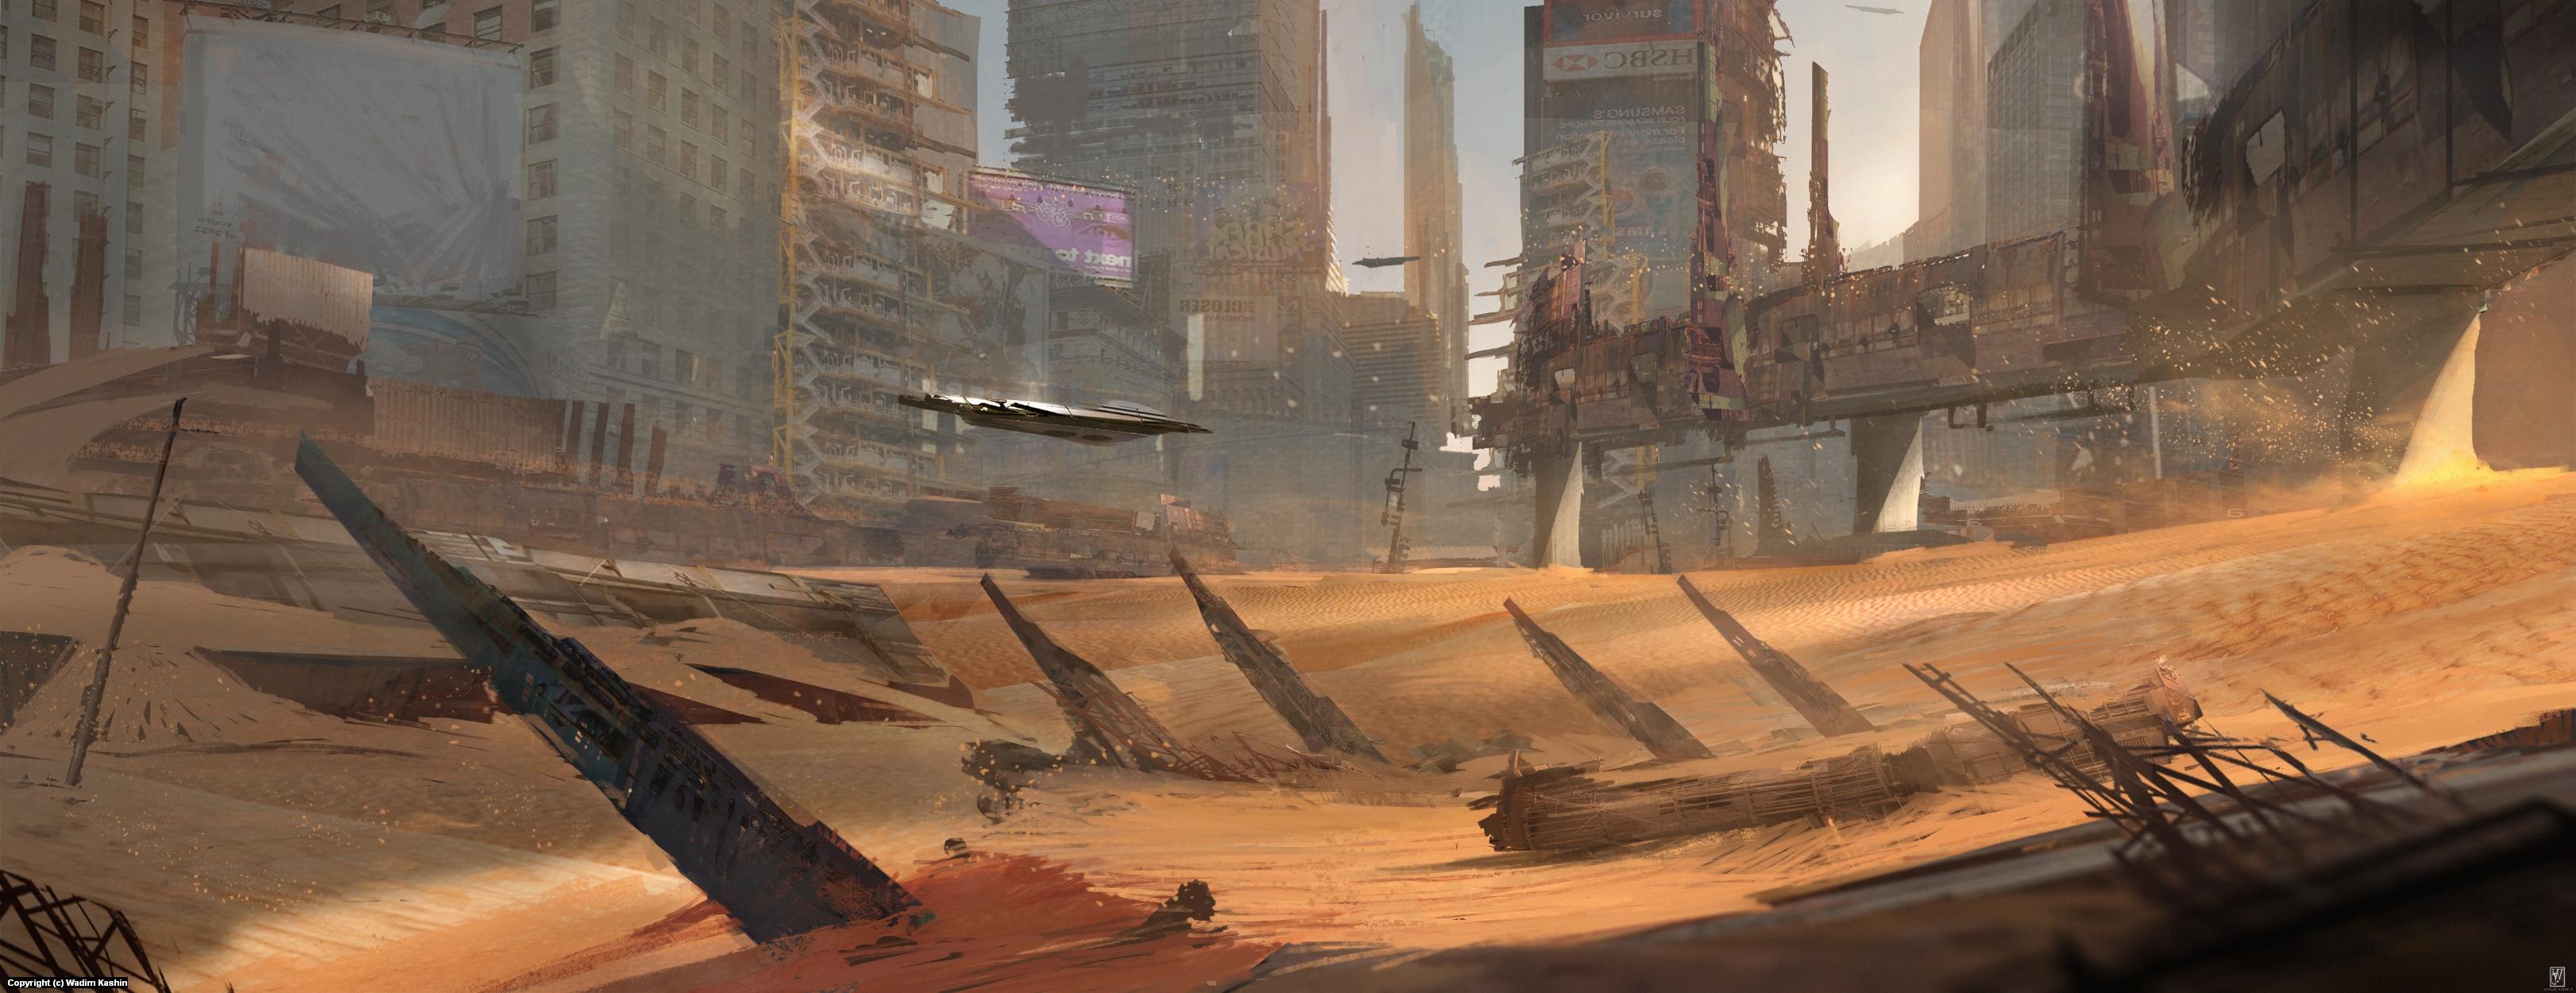 Desert City Artwork by Wadim Kashin